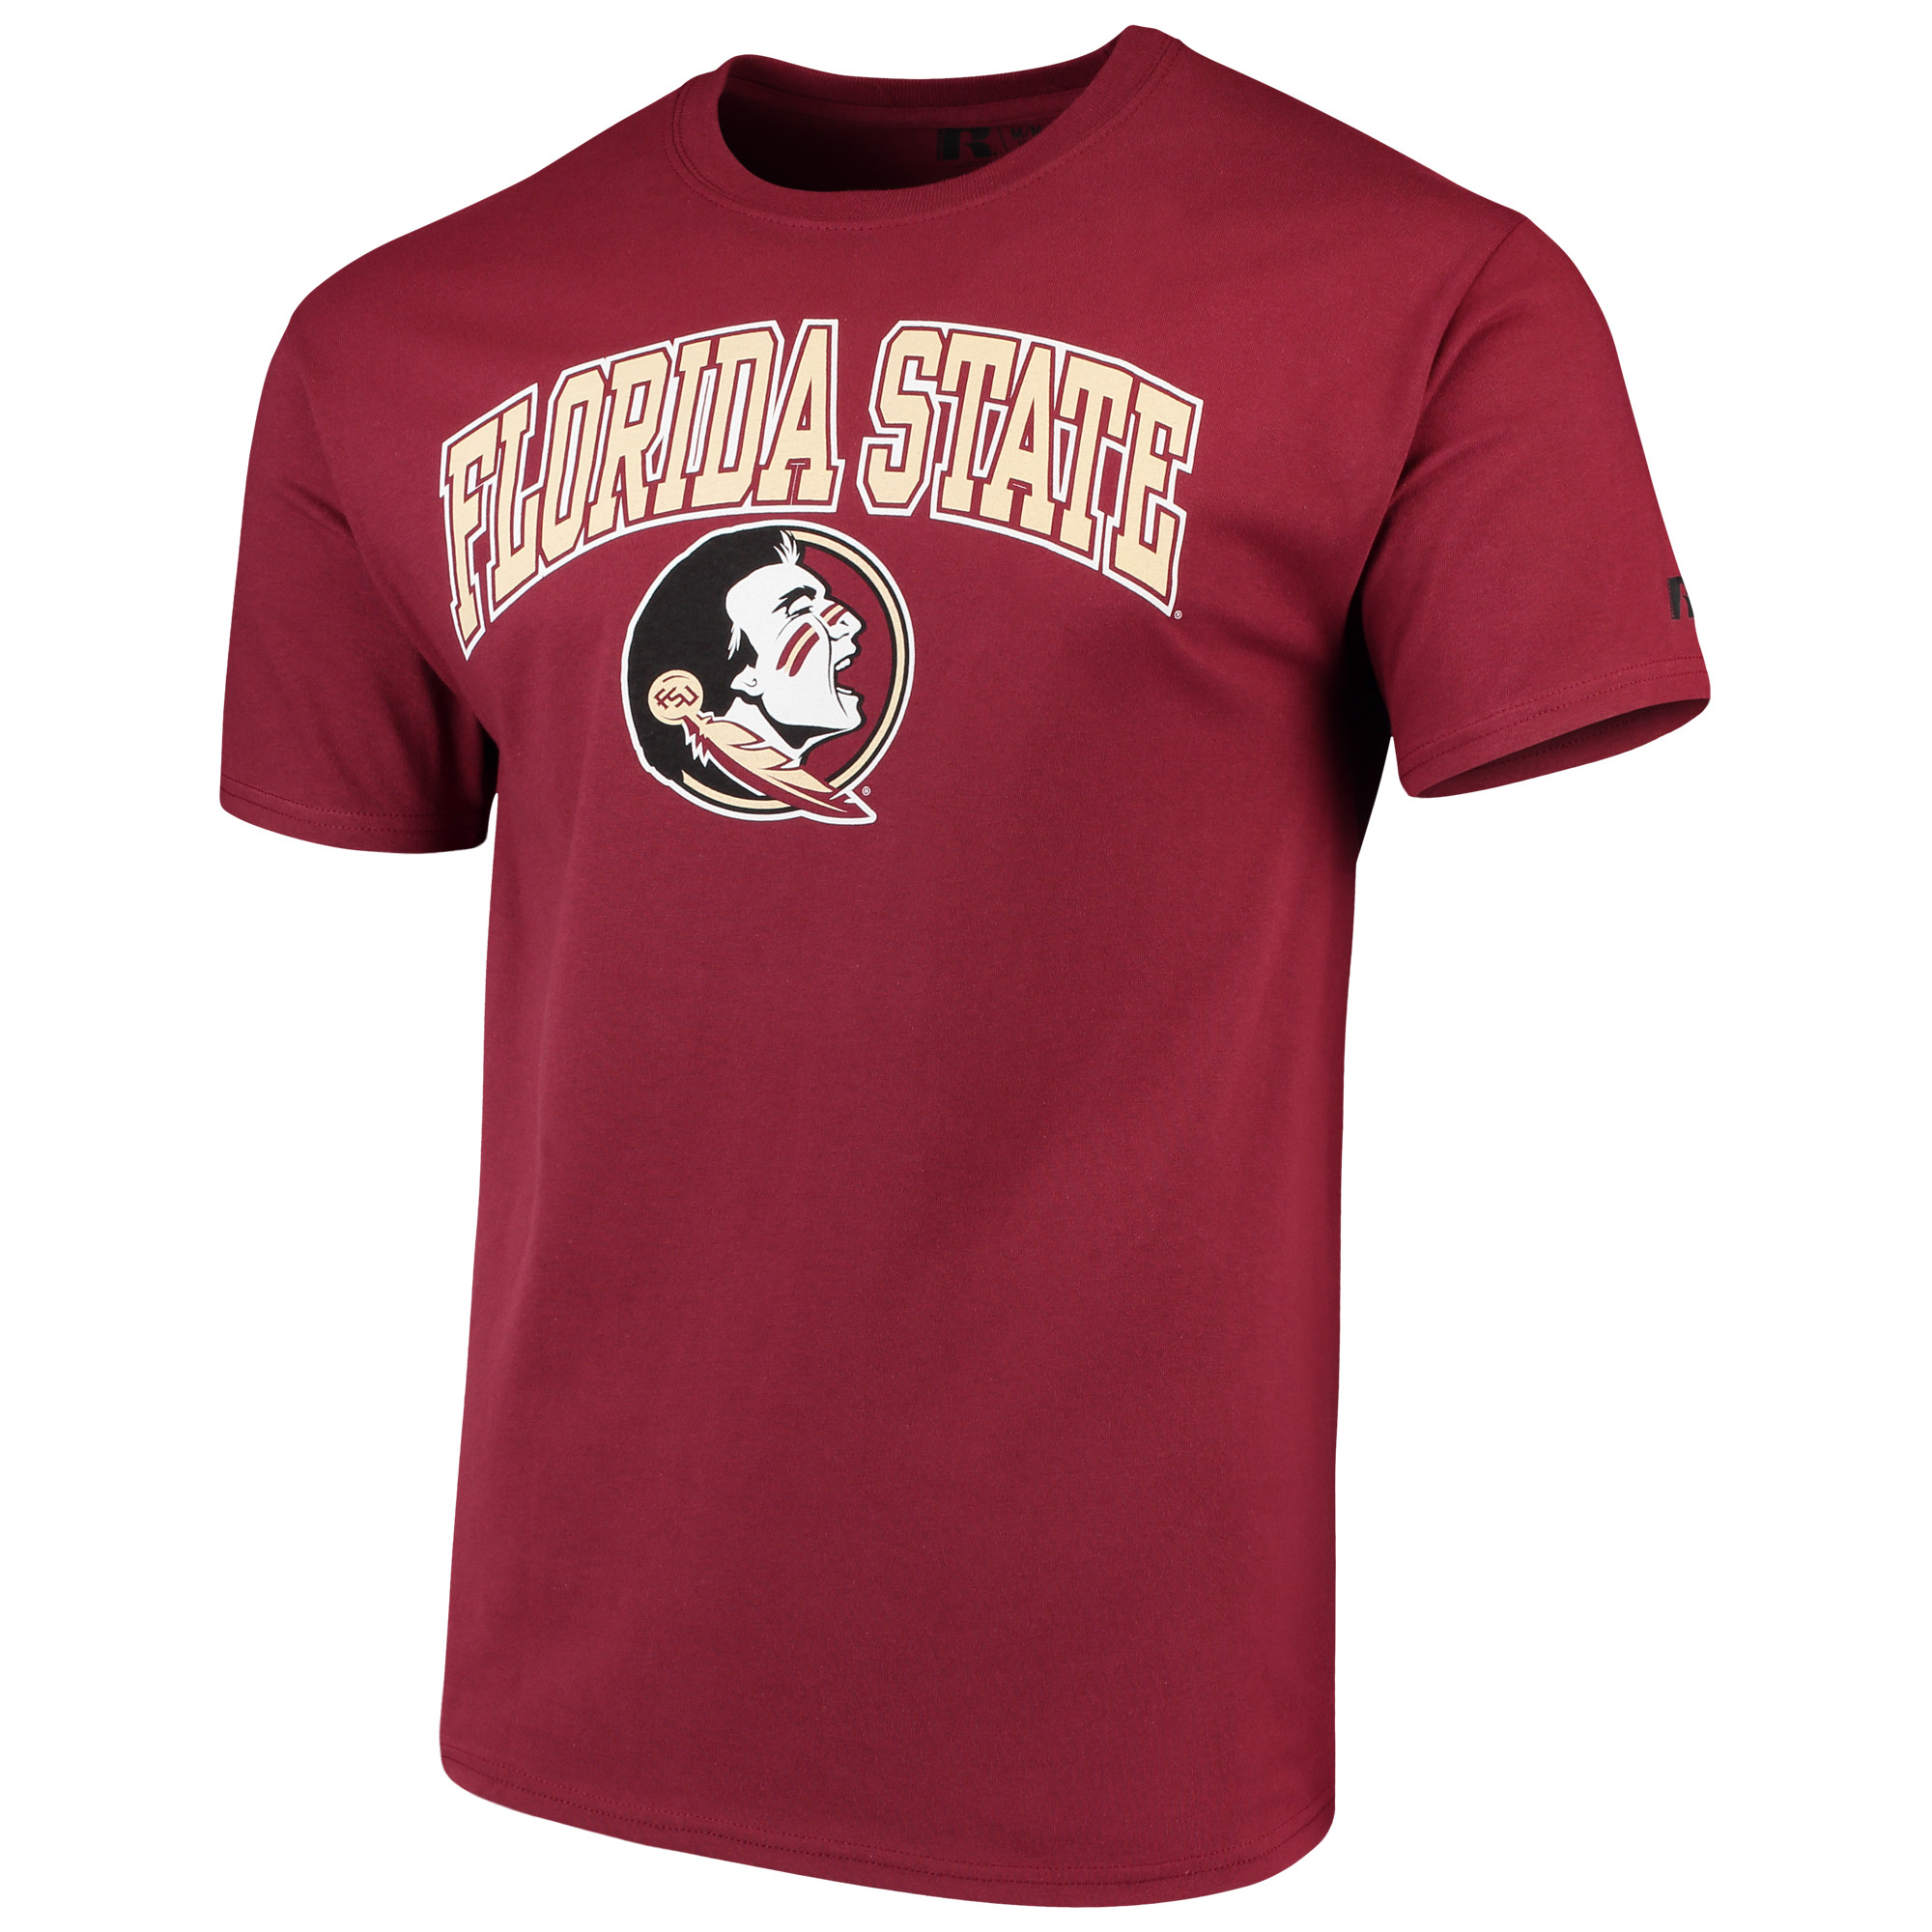 Men's Russell Garnet Florida State Seminoles Crew Core Print T-Shirt